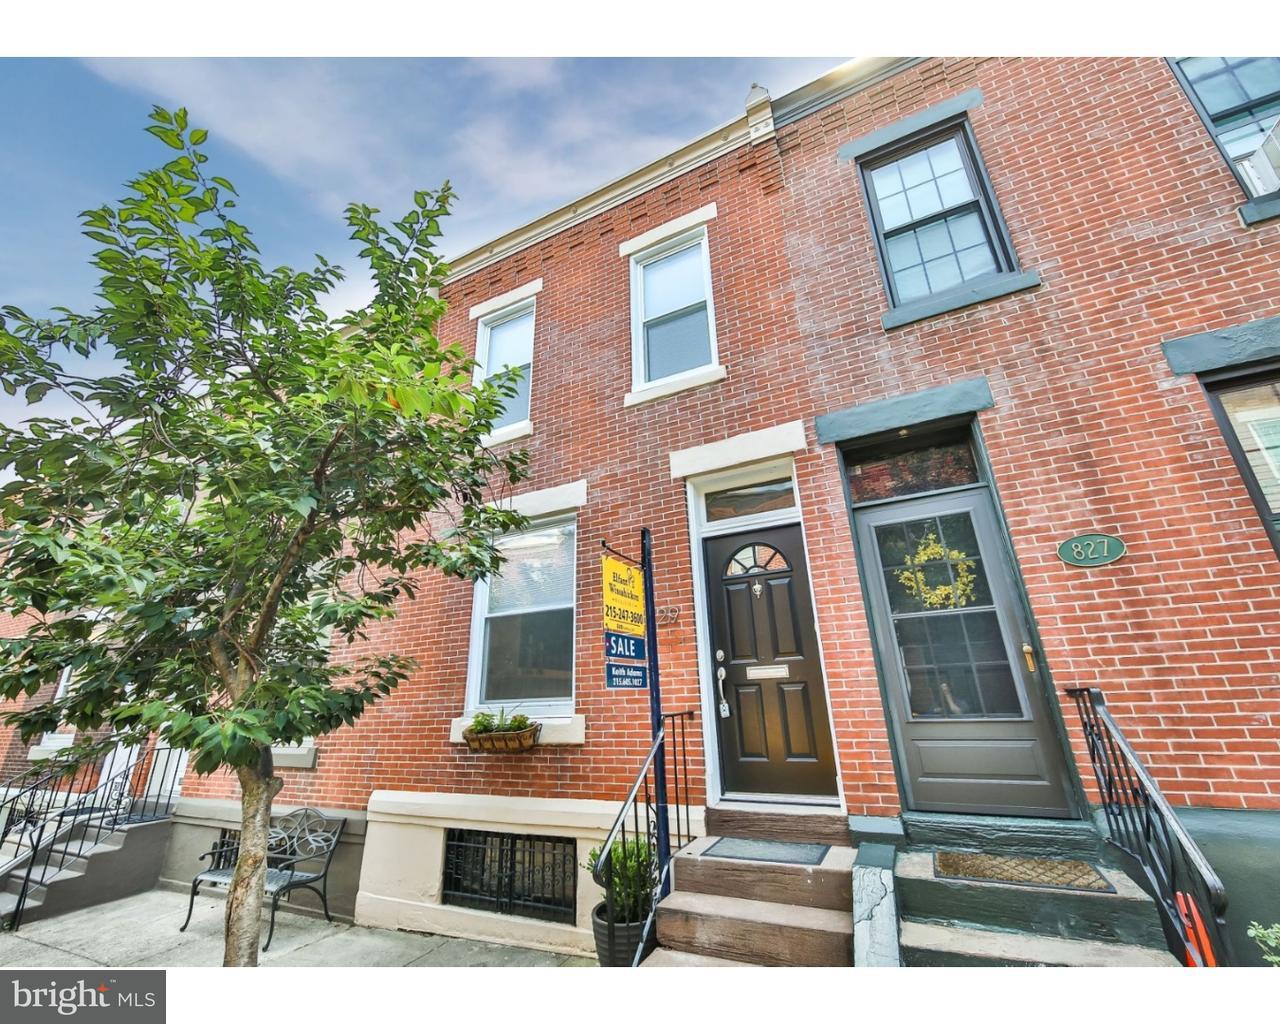 829 N Taylor Street Philadelphia, PA 19130